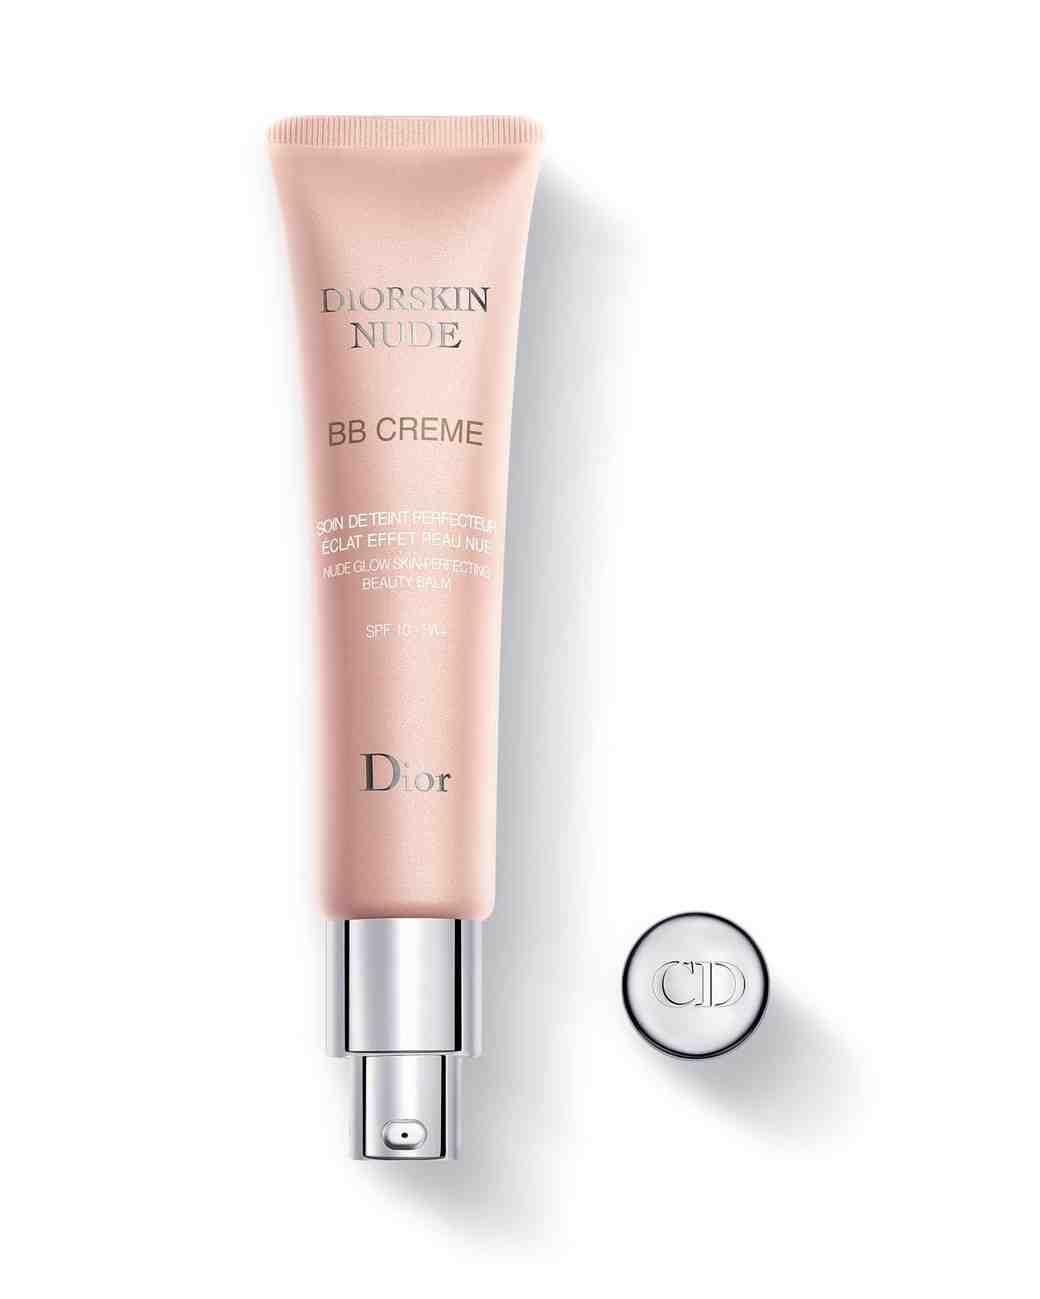 big-day-beauty-awards-dior-nude-skin-bb-creme-0216.jpg